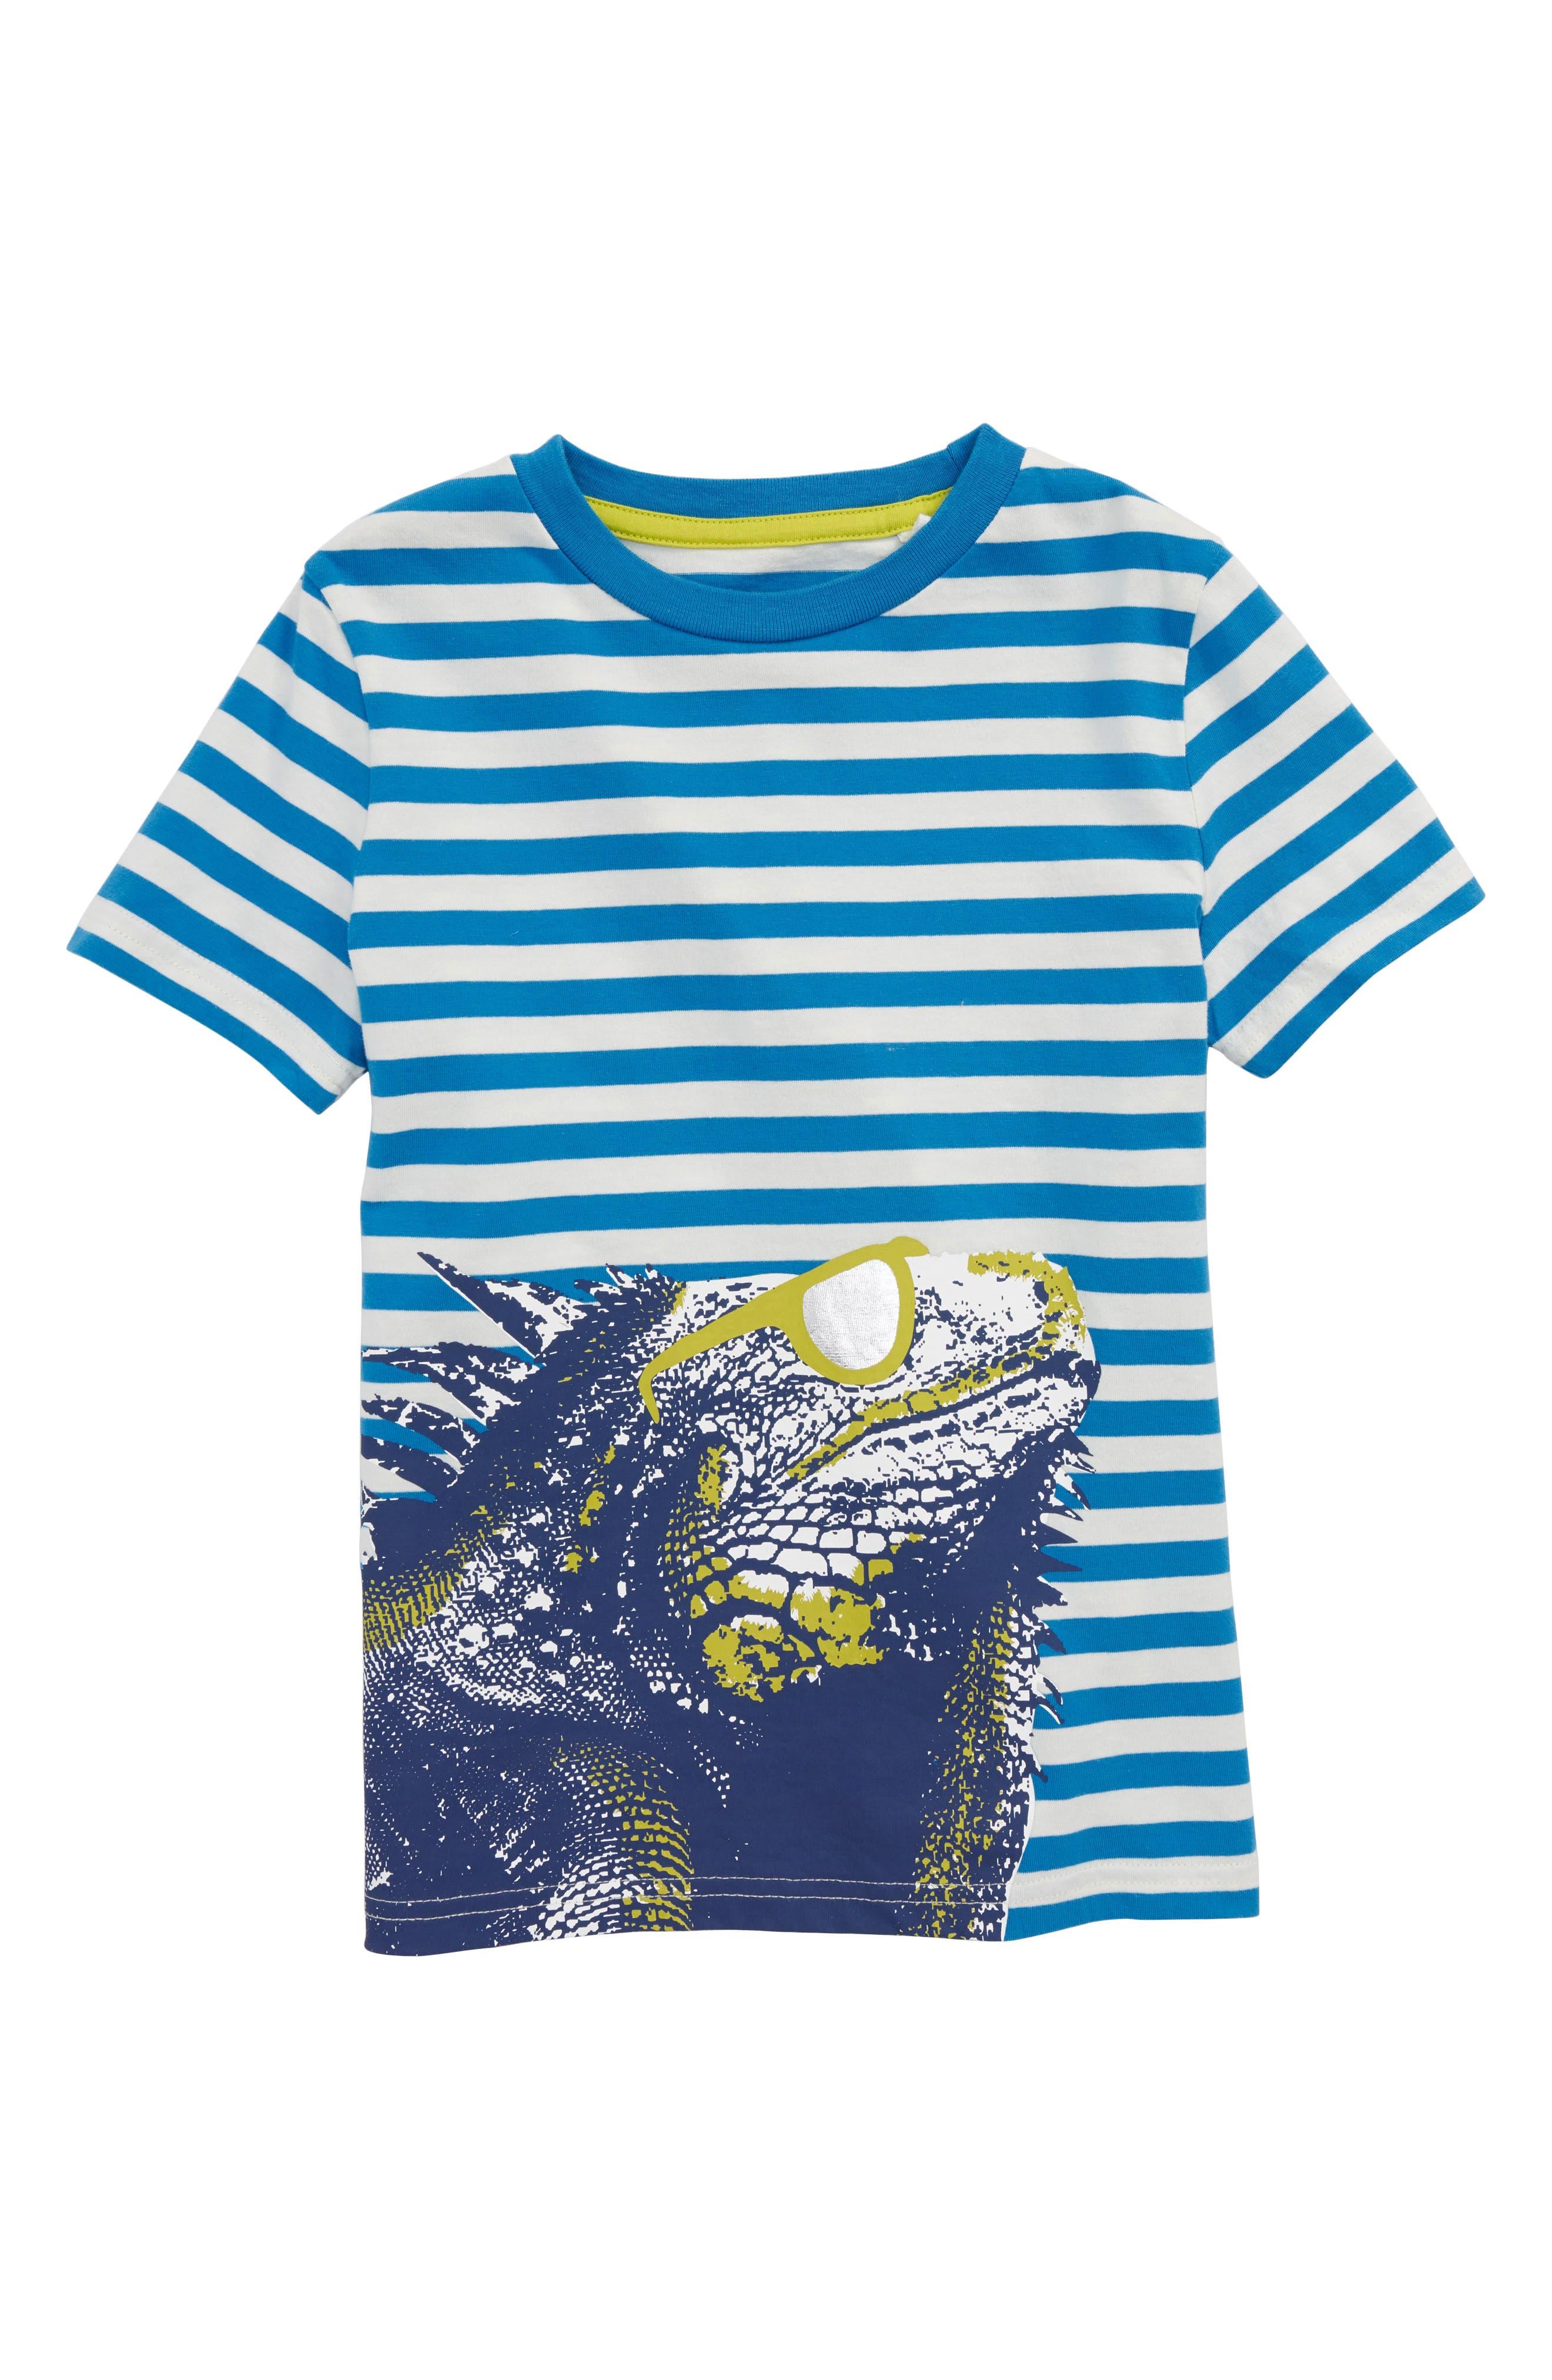 Arty Iguana T-Shirt,                             Main thumbnail 1, color,                             424